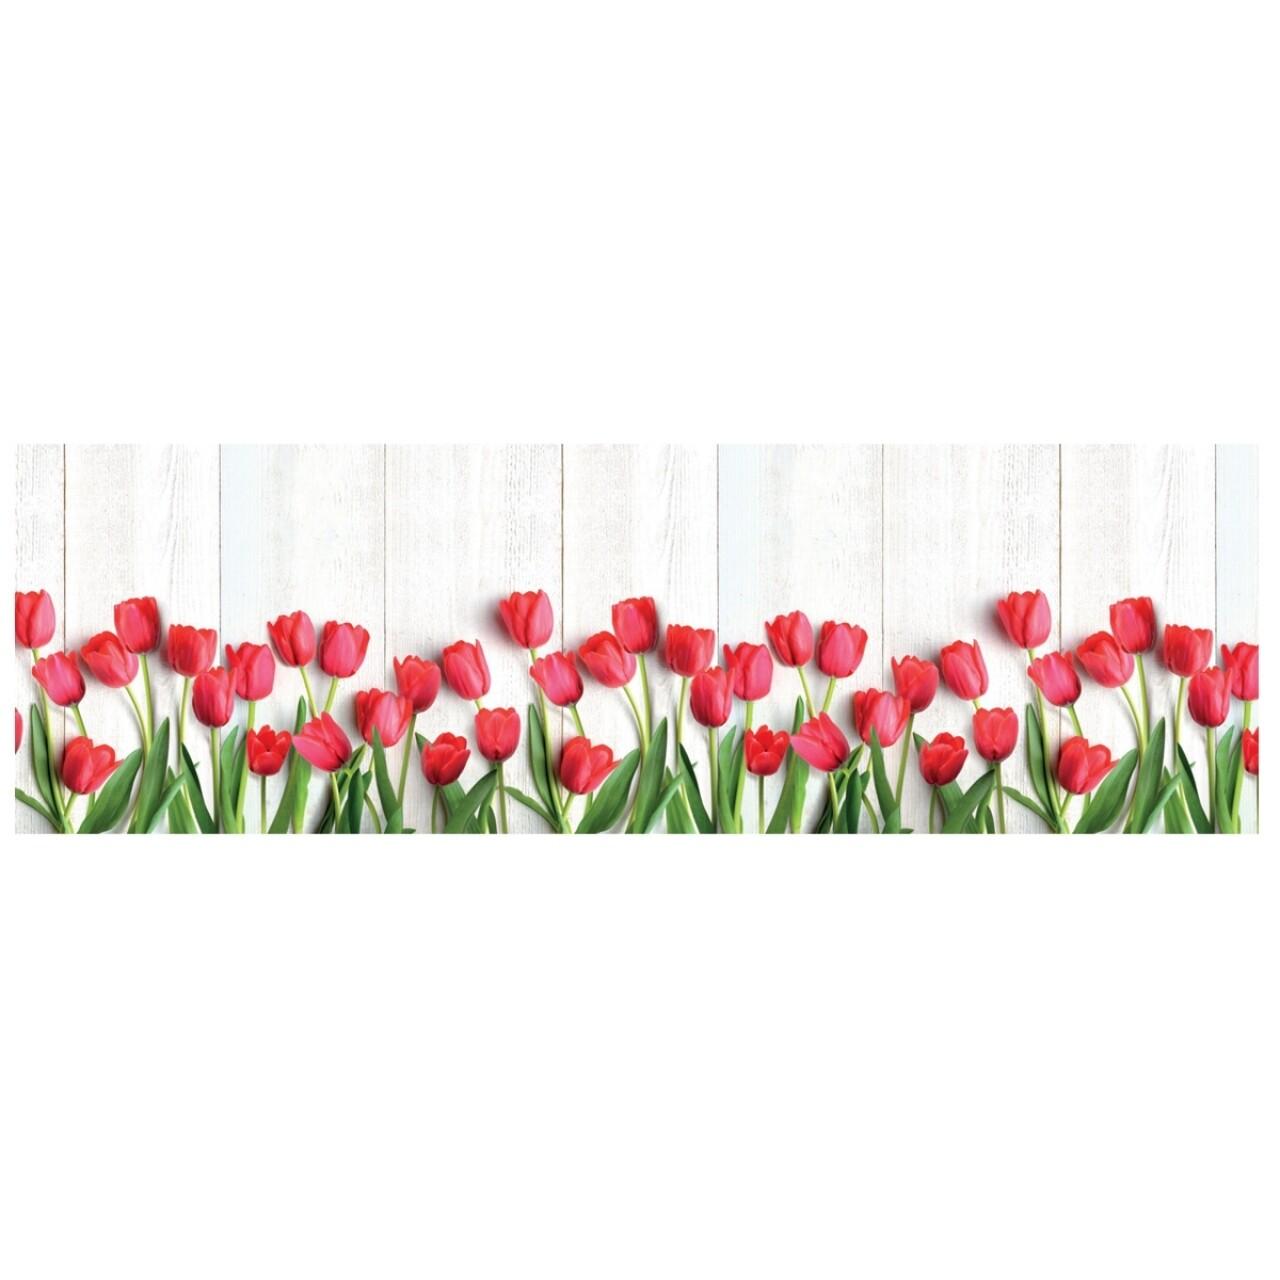 Covor rezistent Webtappeti Tulipani 58 x 140 cm, alb/verde/rosu